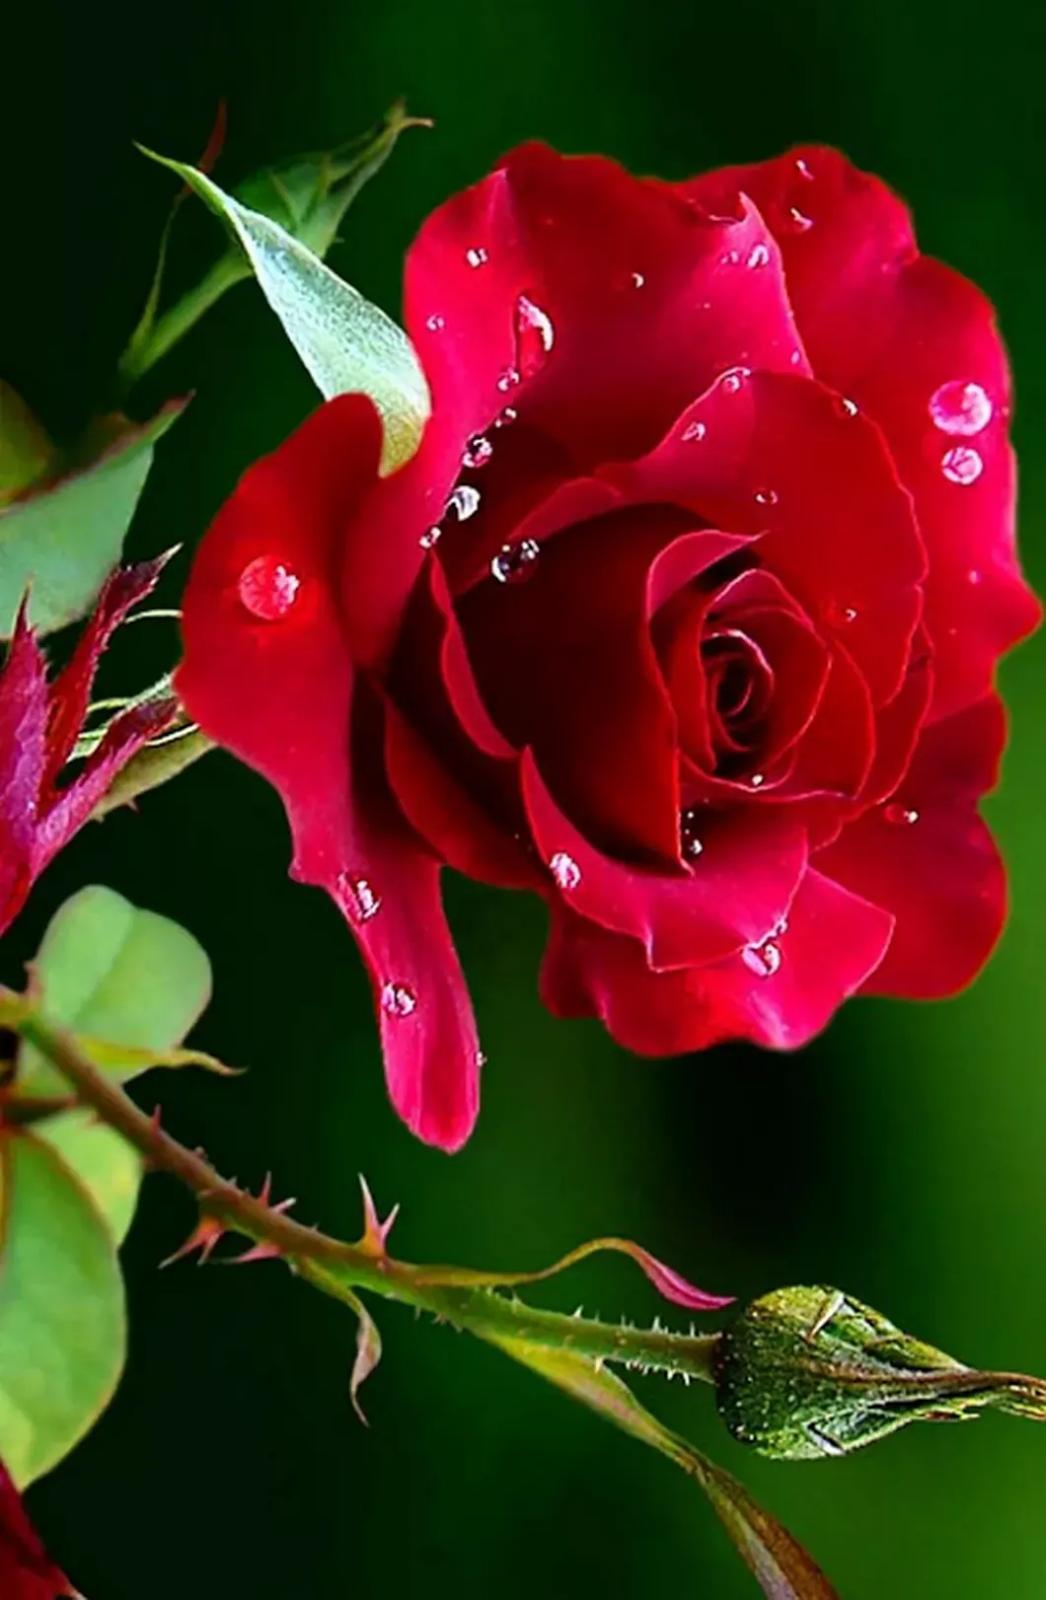 Gambar Bunga Mawar اجمل ورد في العالم 1046x1600 Wallpaper Teahub Io